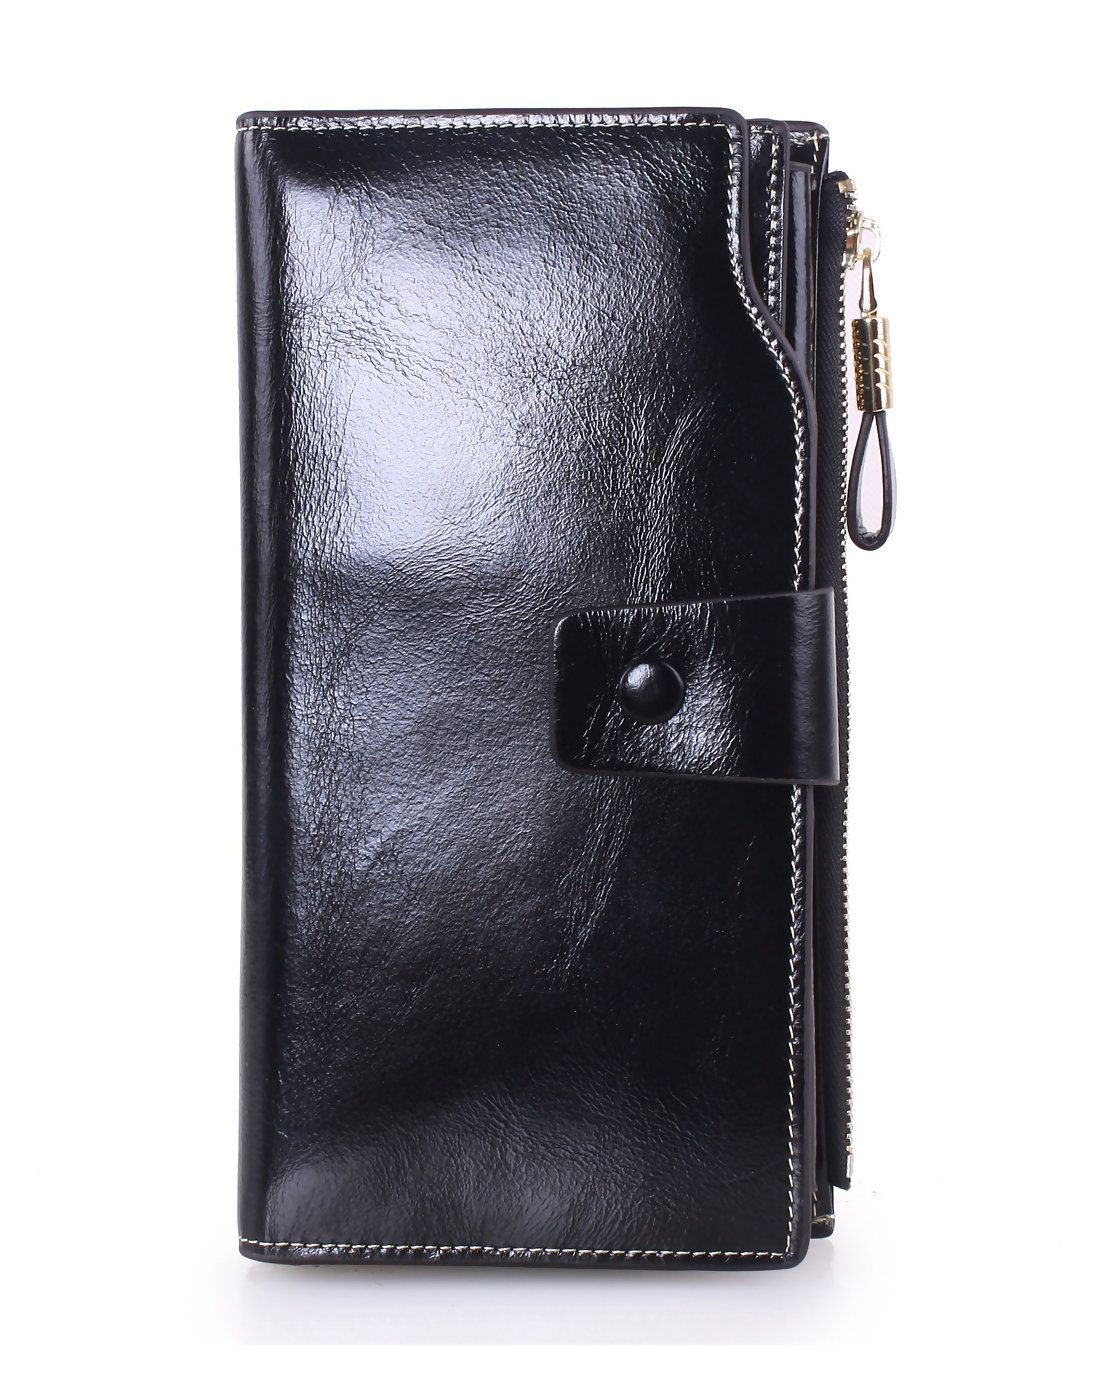 AdoreWe VIPme Wallets Melovo Womenus Genuine Leather Black Long